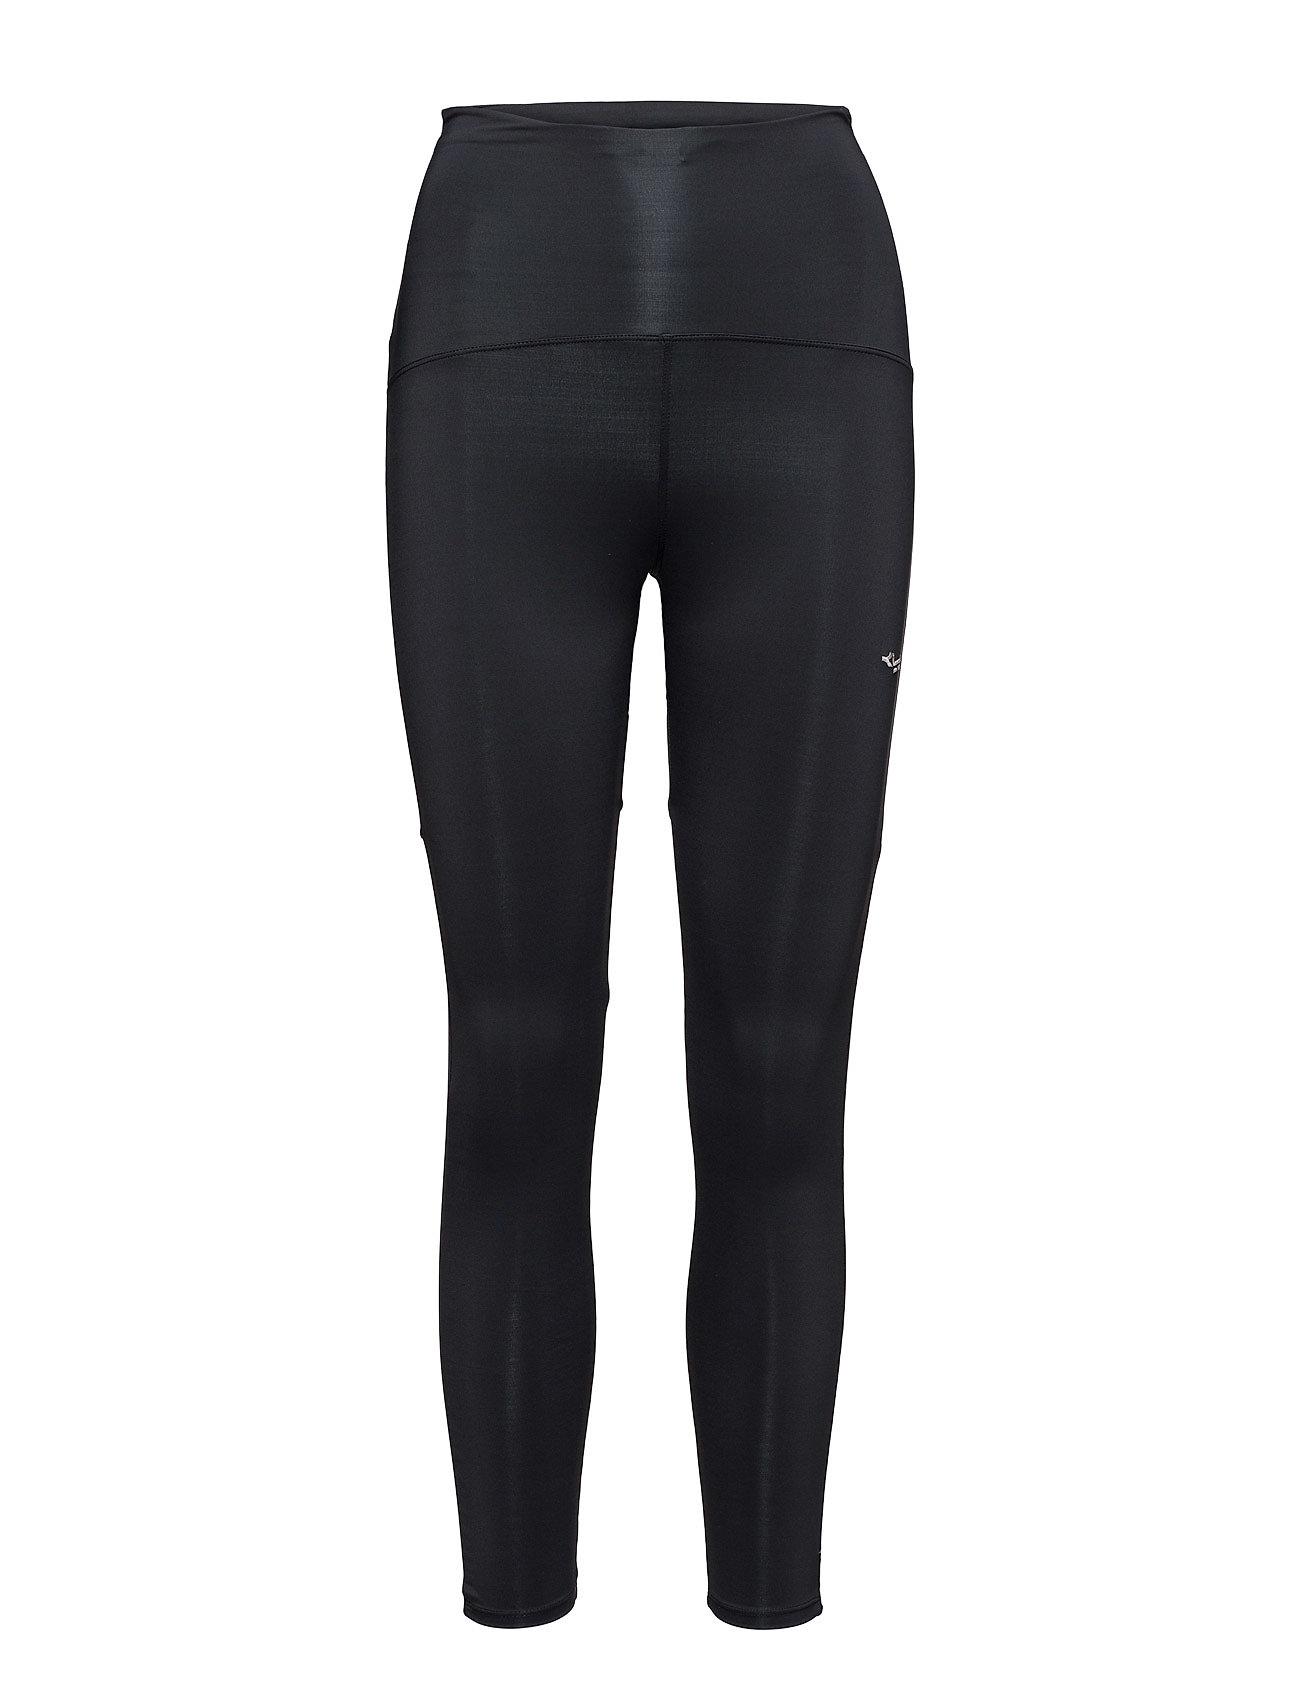 Shape Maj 7/8 Tights Röhnisch Trænings leggings til Damer i Sølv